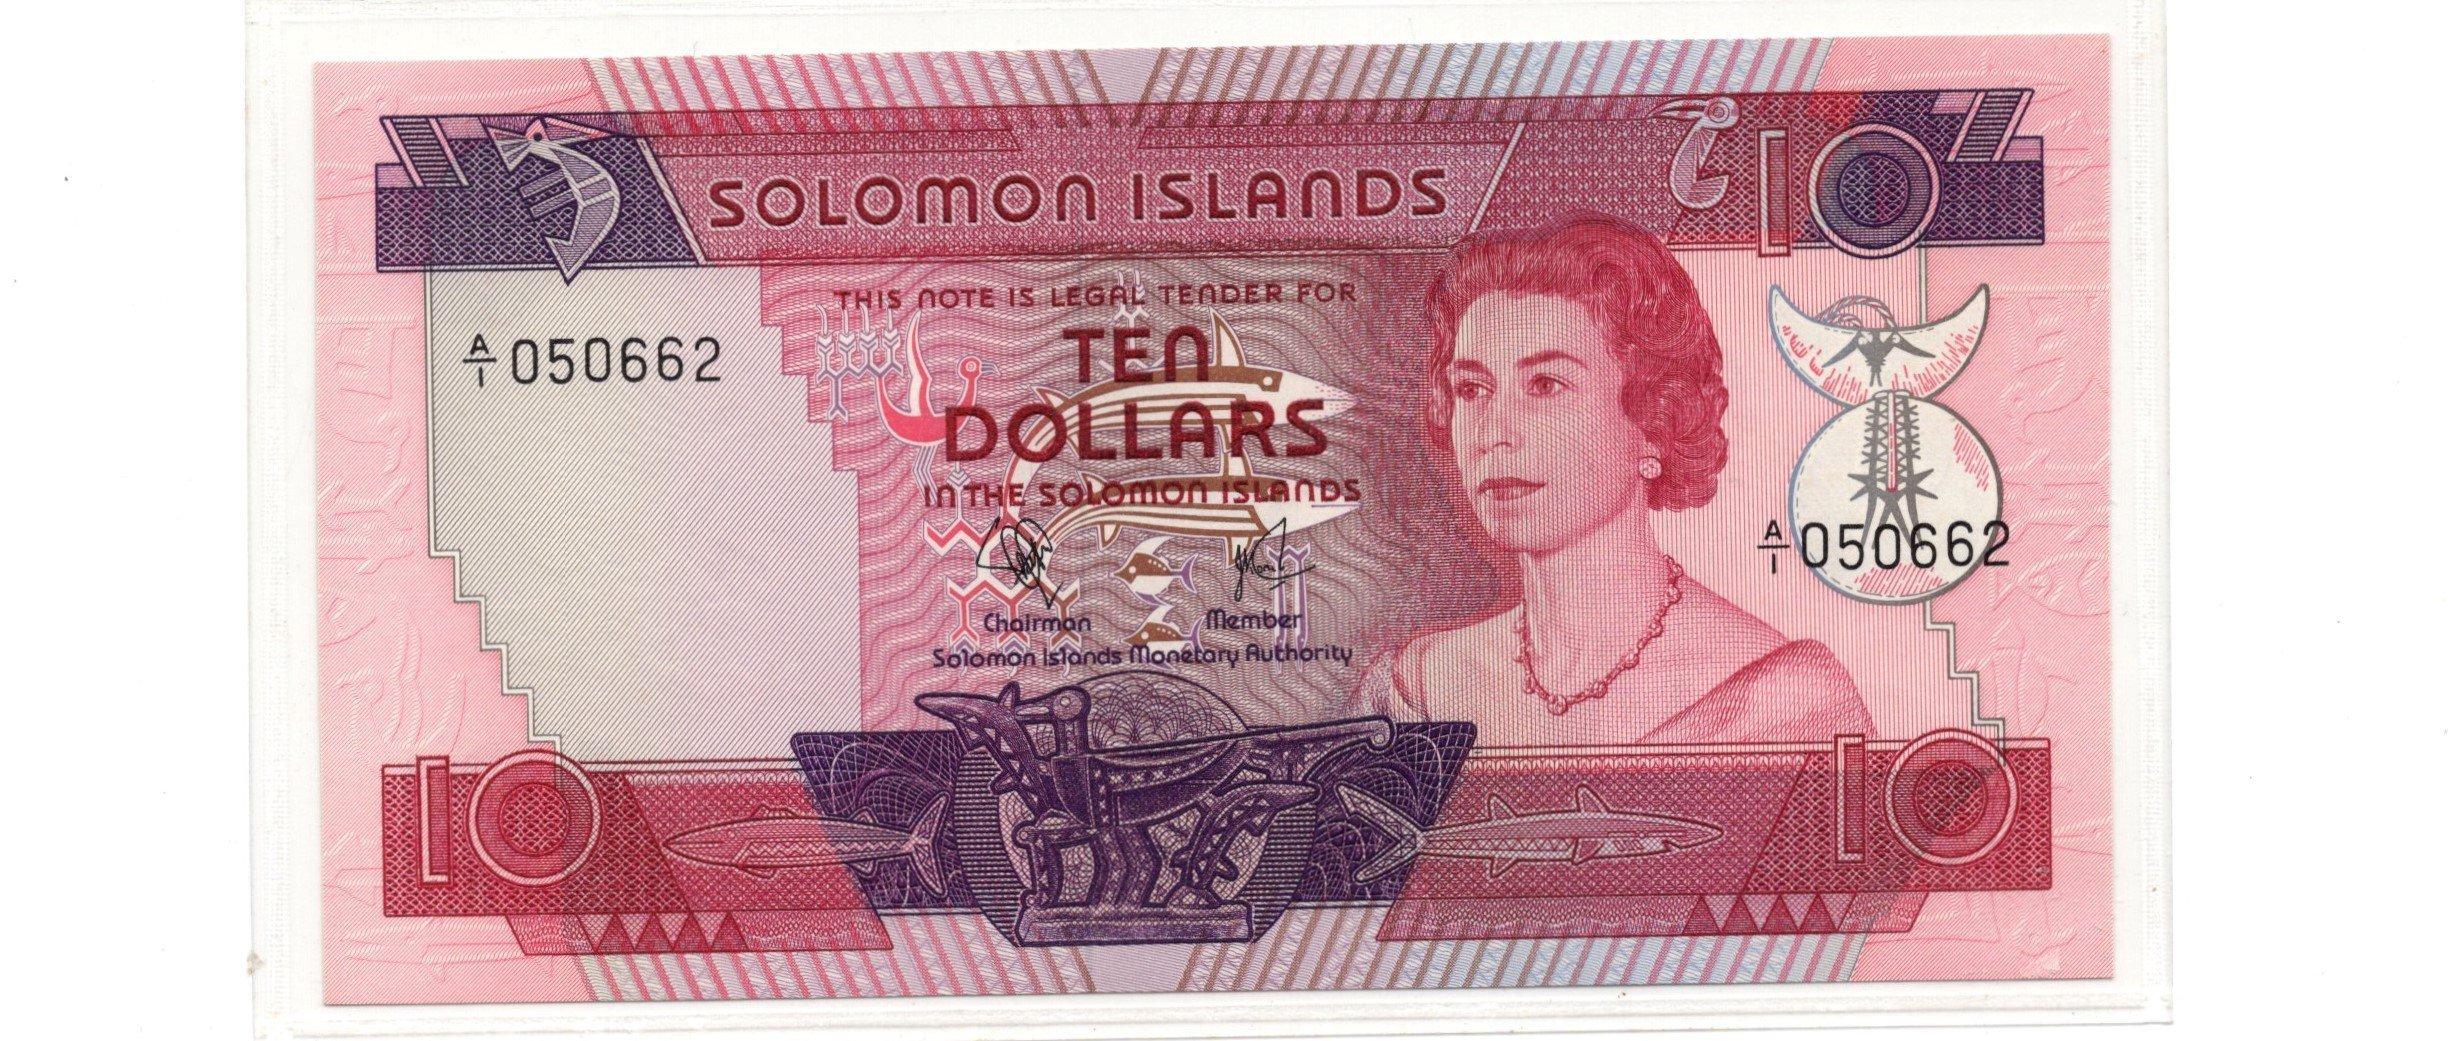 Solomon islands 10 dollars